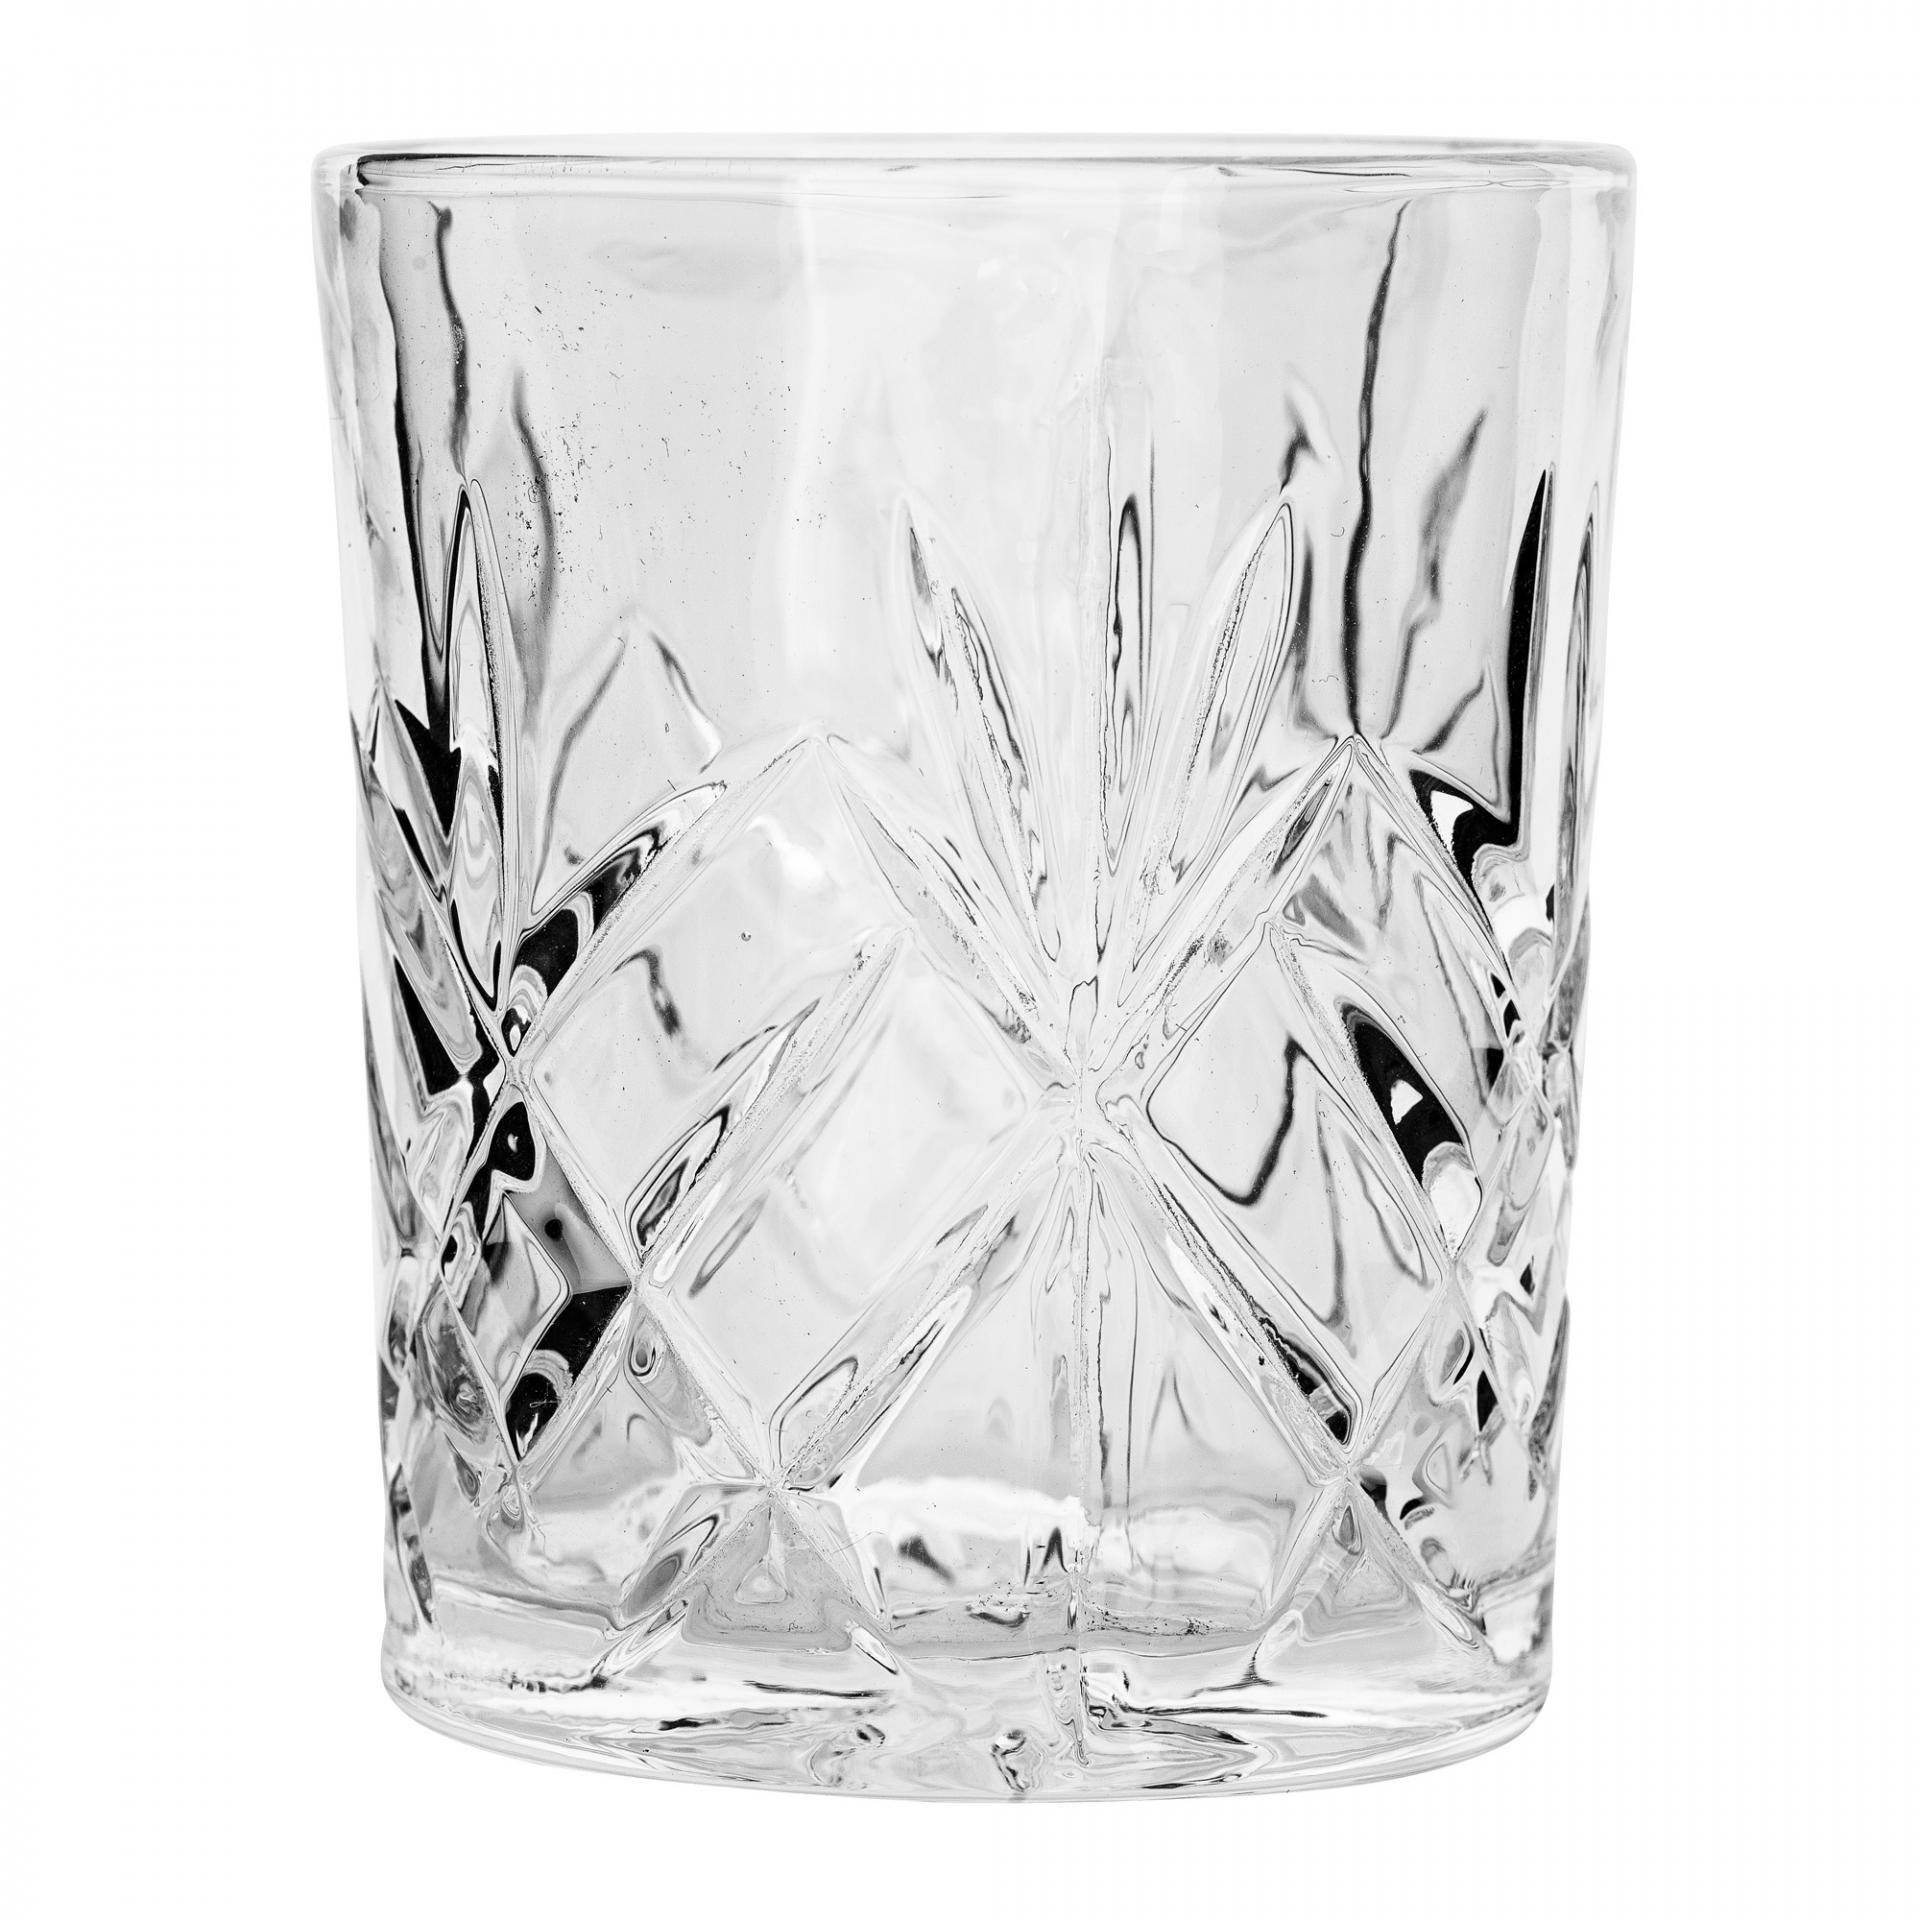 Bloomingville Sklenička Crystal 10 cm, čirá barva, sklo